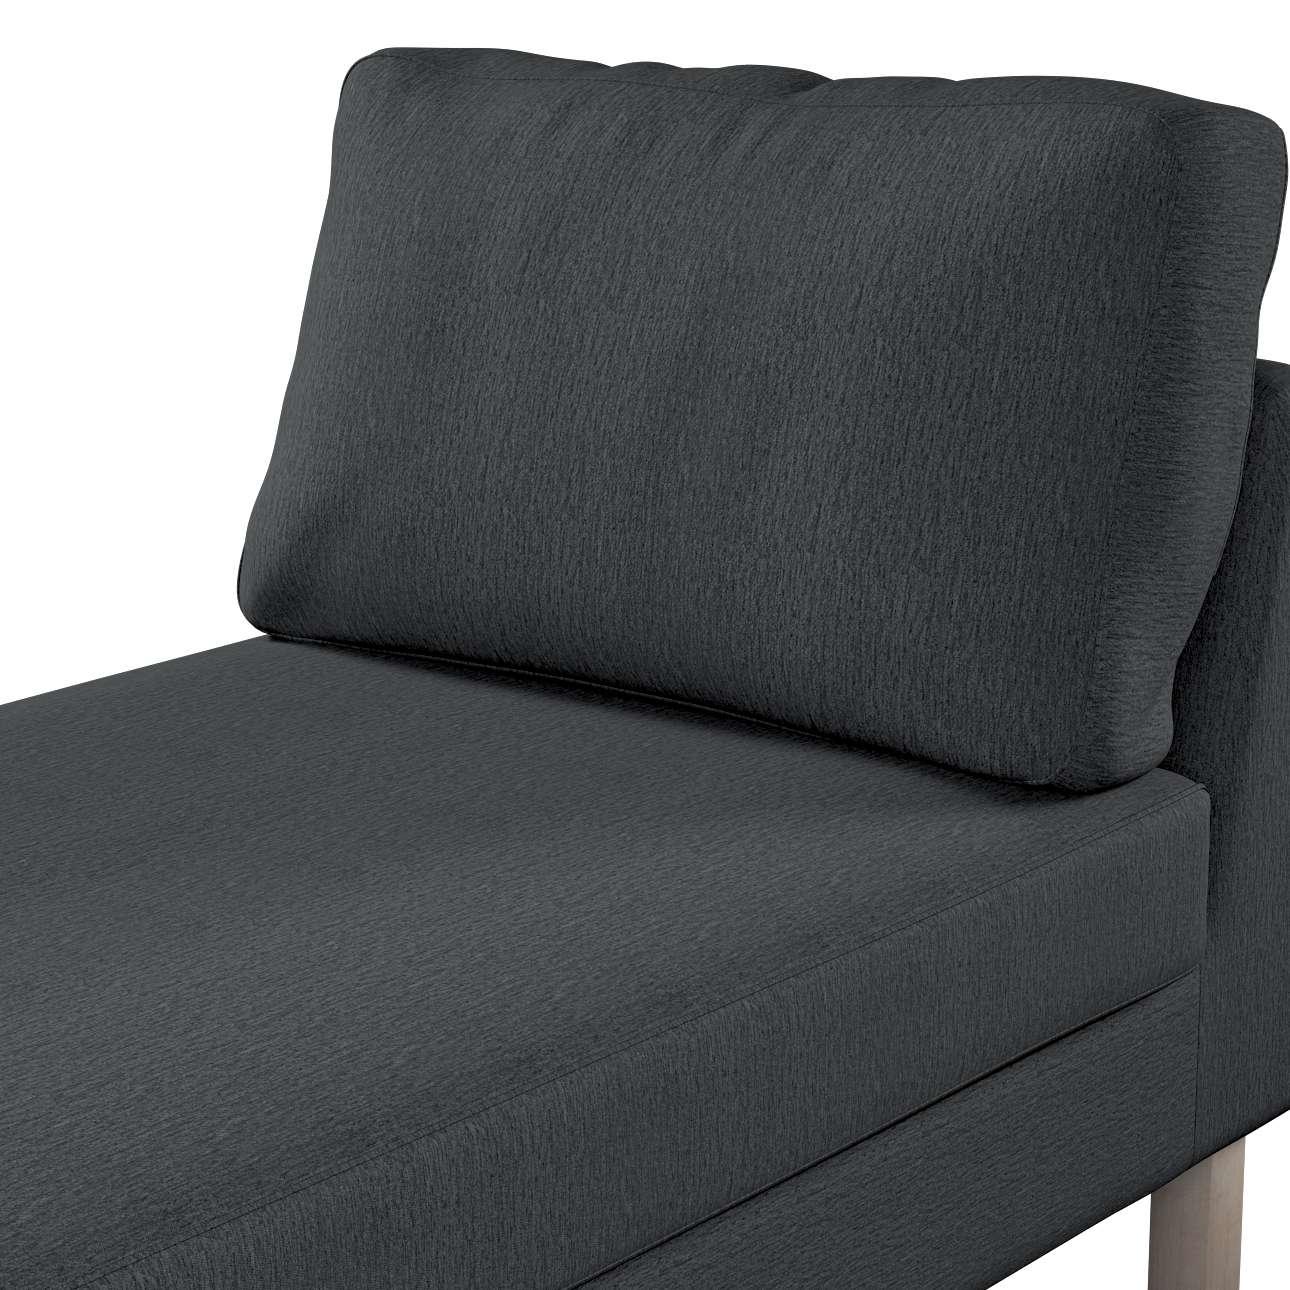 Zitbankhoes, Karlstad chaise lounge van de collectie Chenille, Stof: 702-20